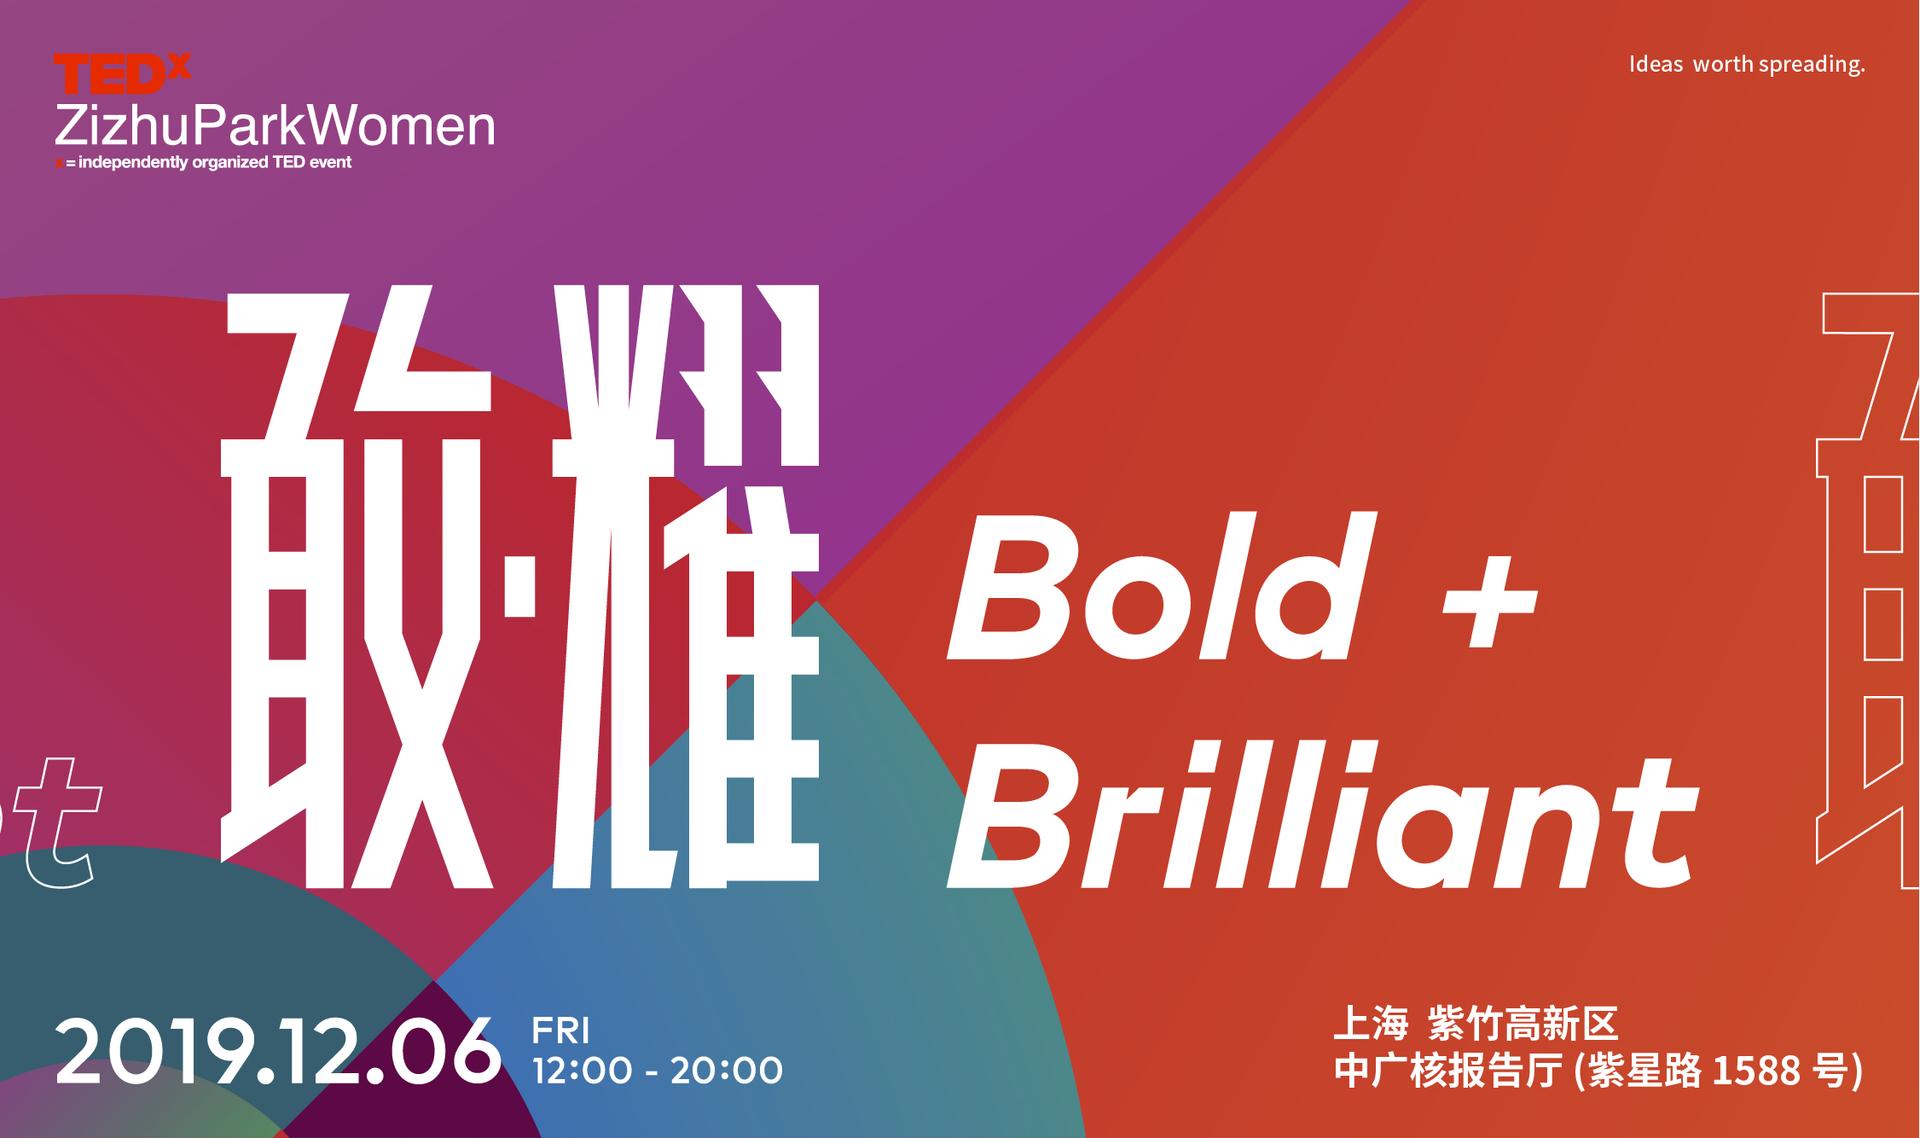 2019 TEDxZizhuParkWomen年度大会「敢•耀|Bold+Brilliant」